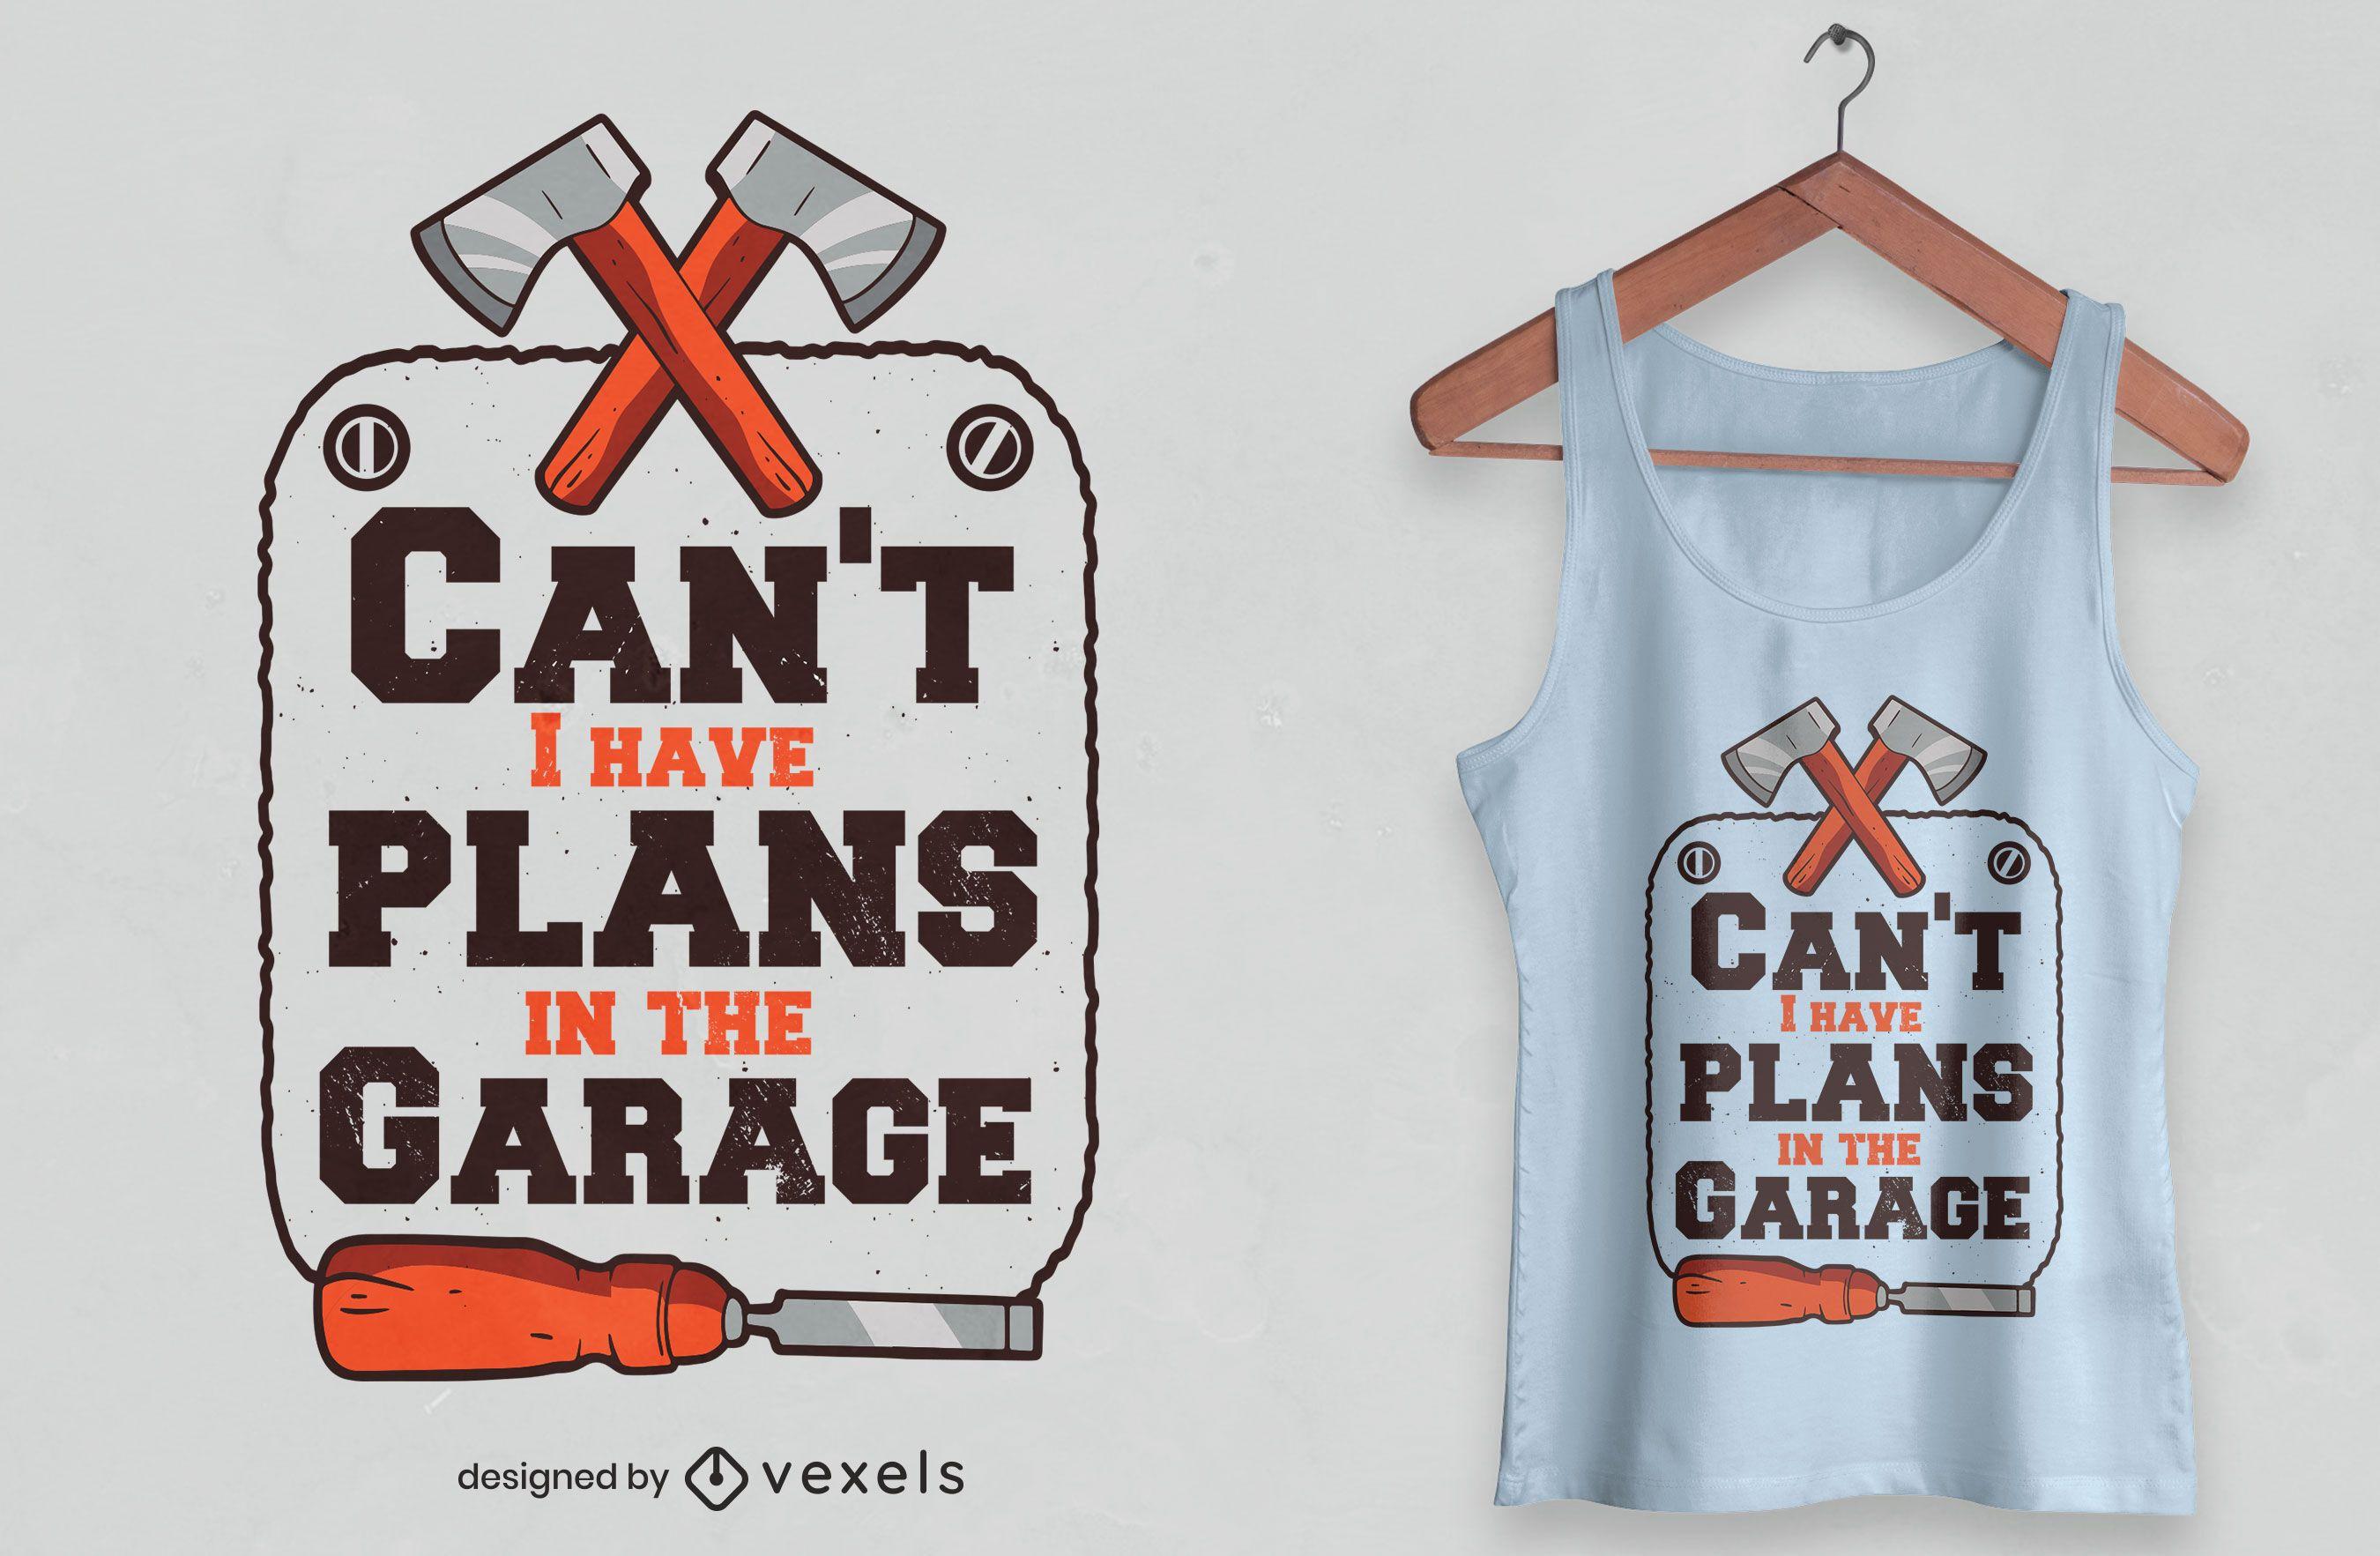 Garage plans quote t-shirt design